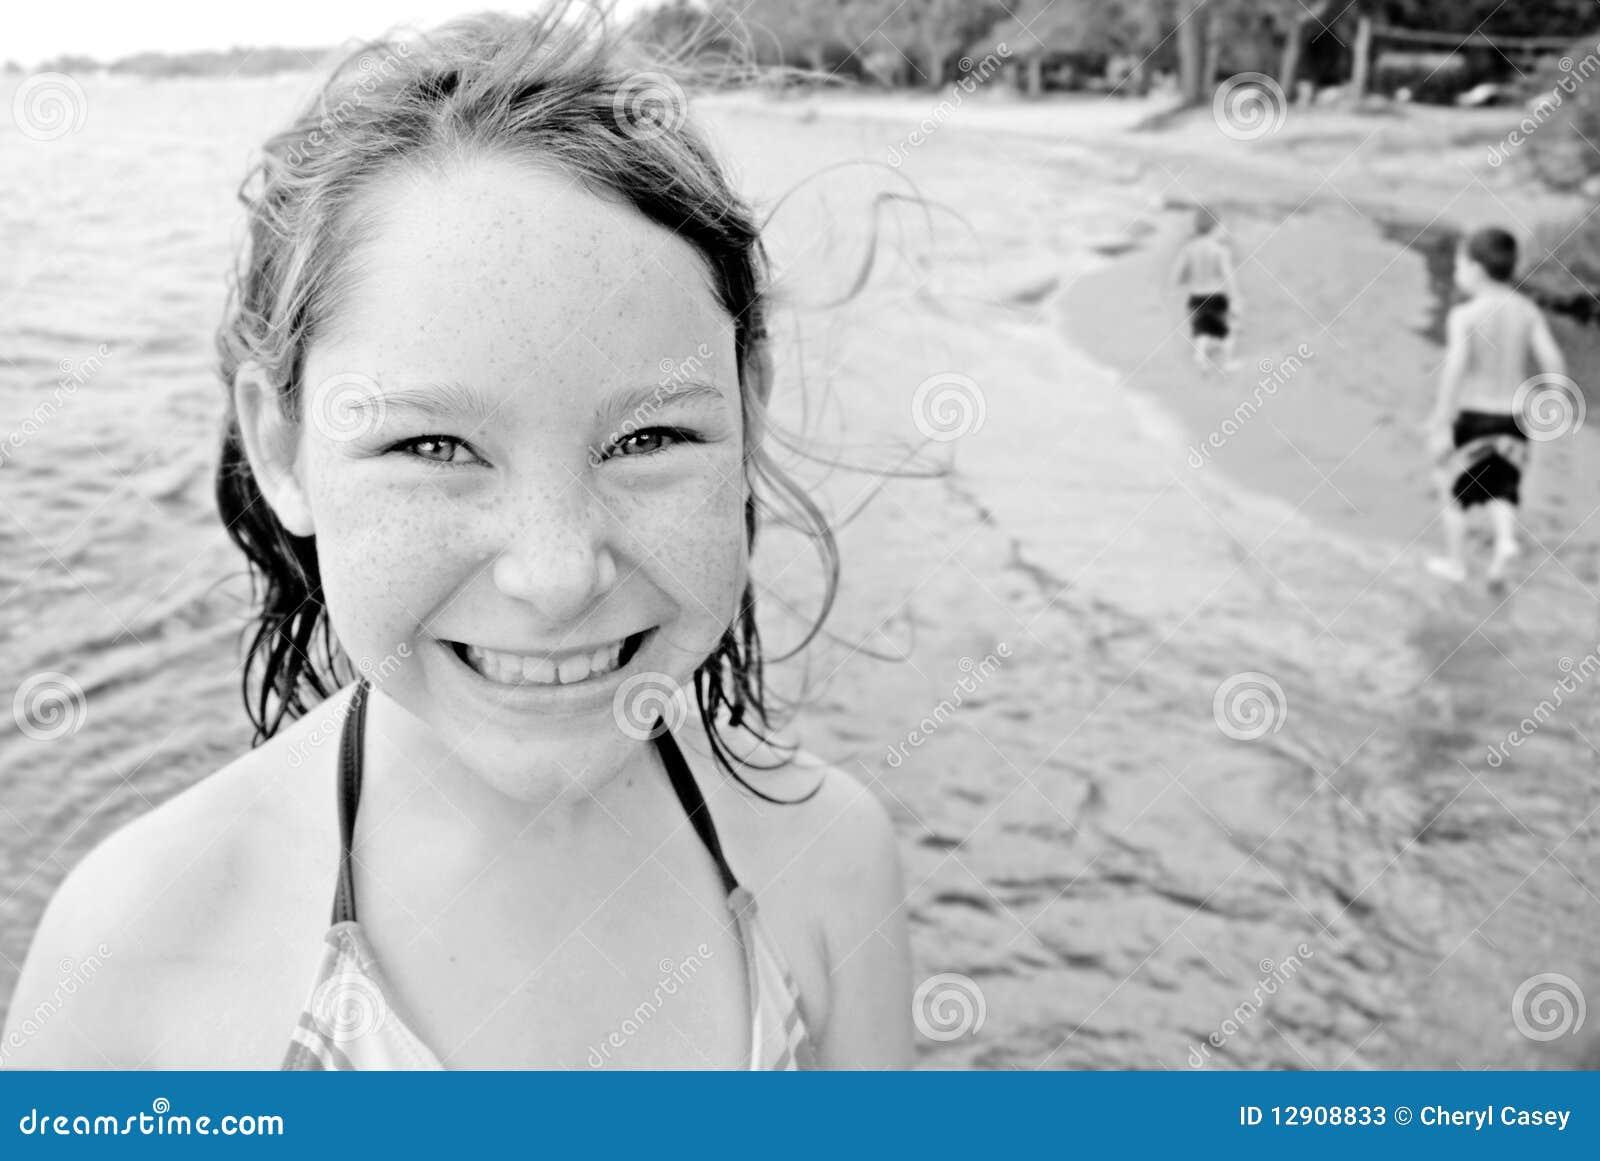 Children Playing At Seashore Stock Photos Image 12908833